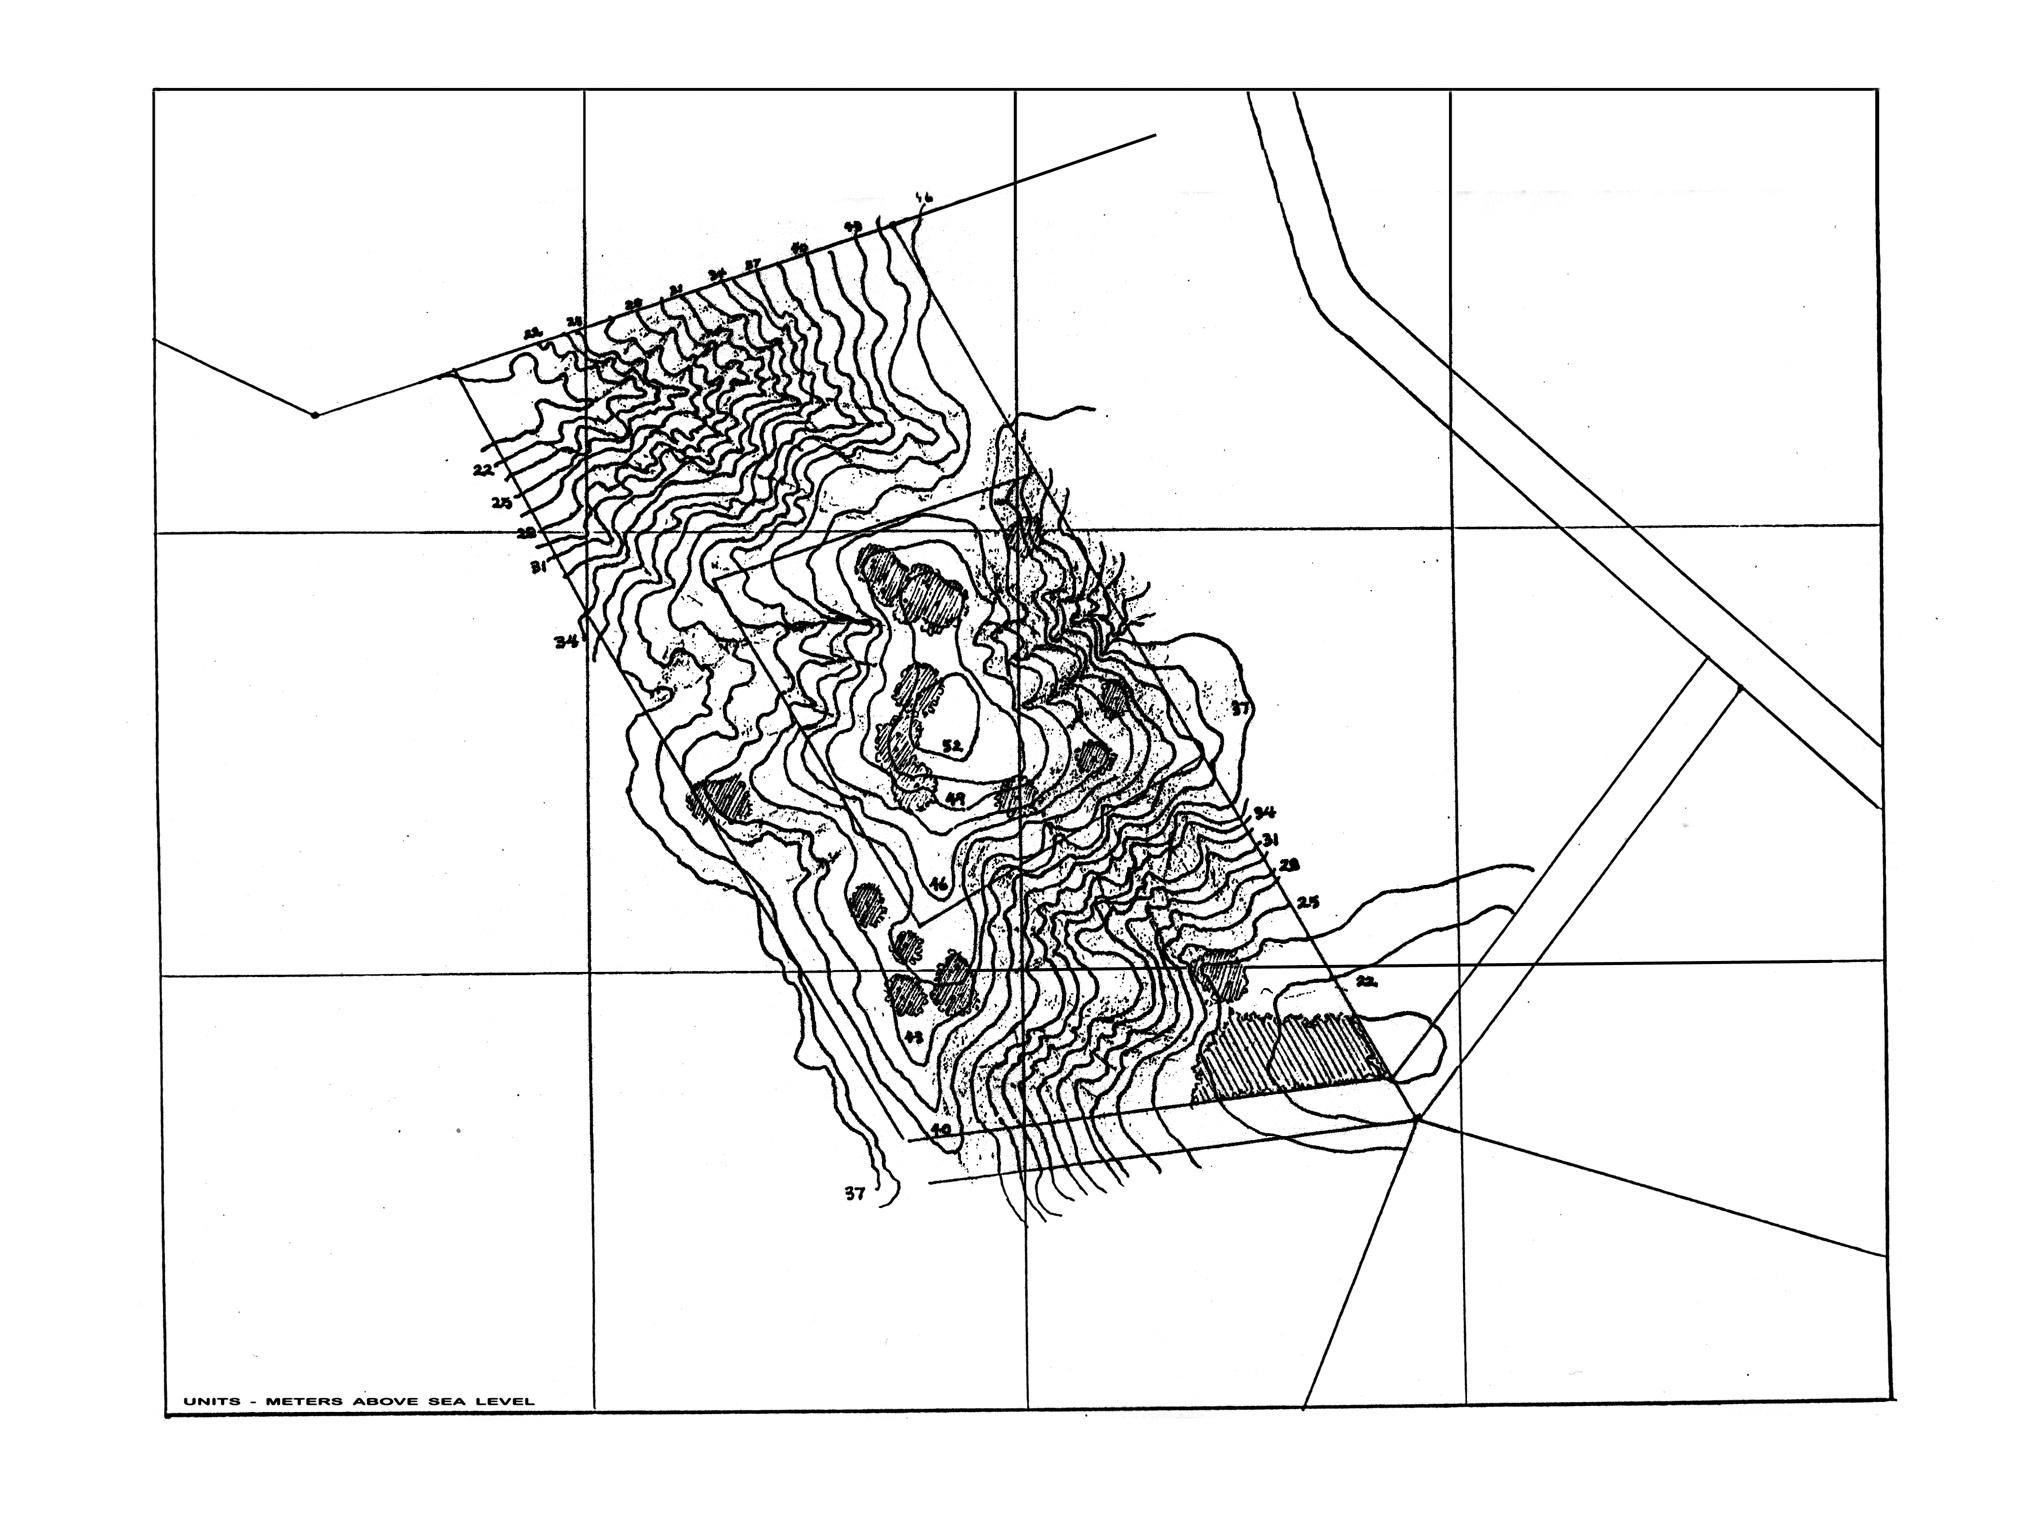 wiring clarion diagram db285usb